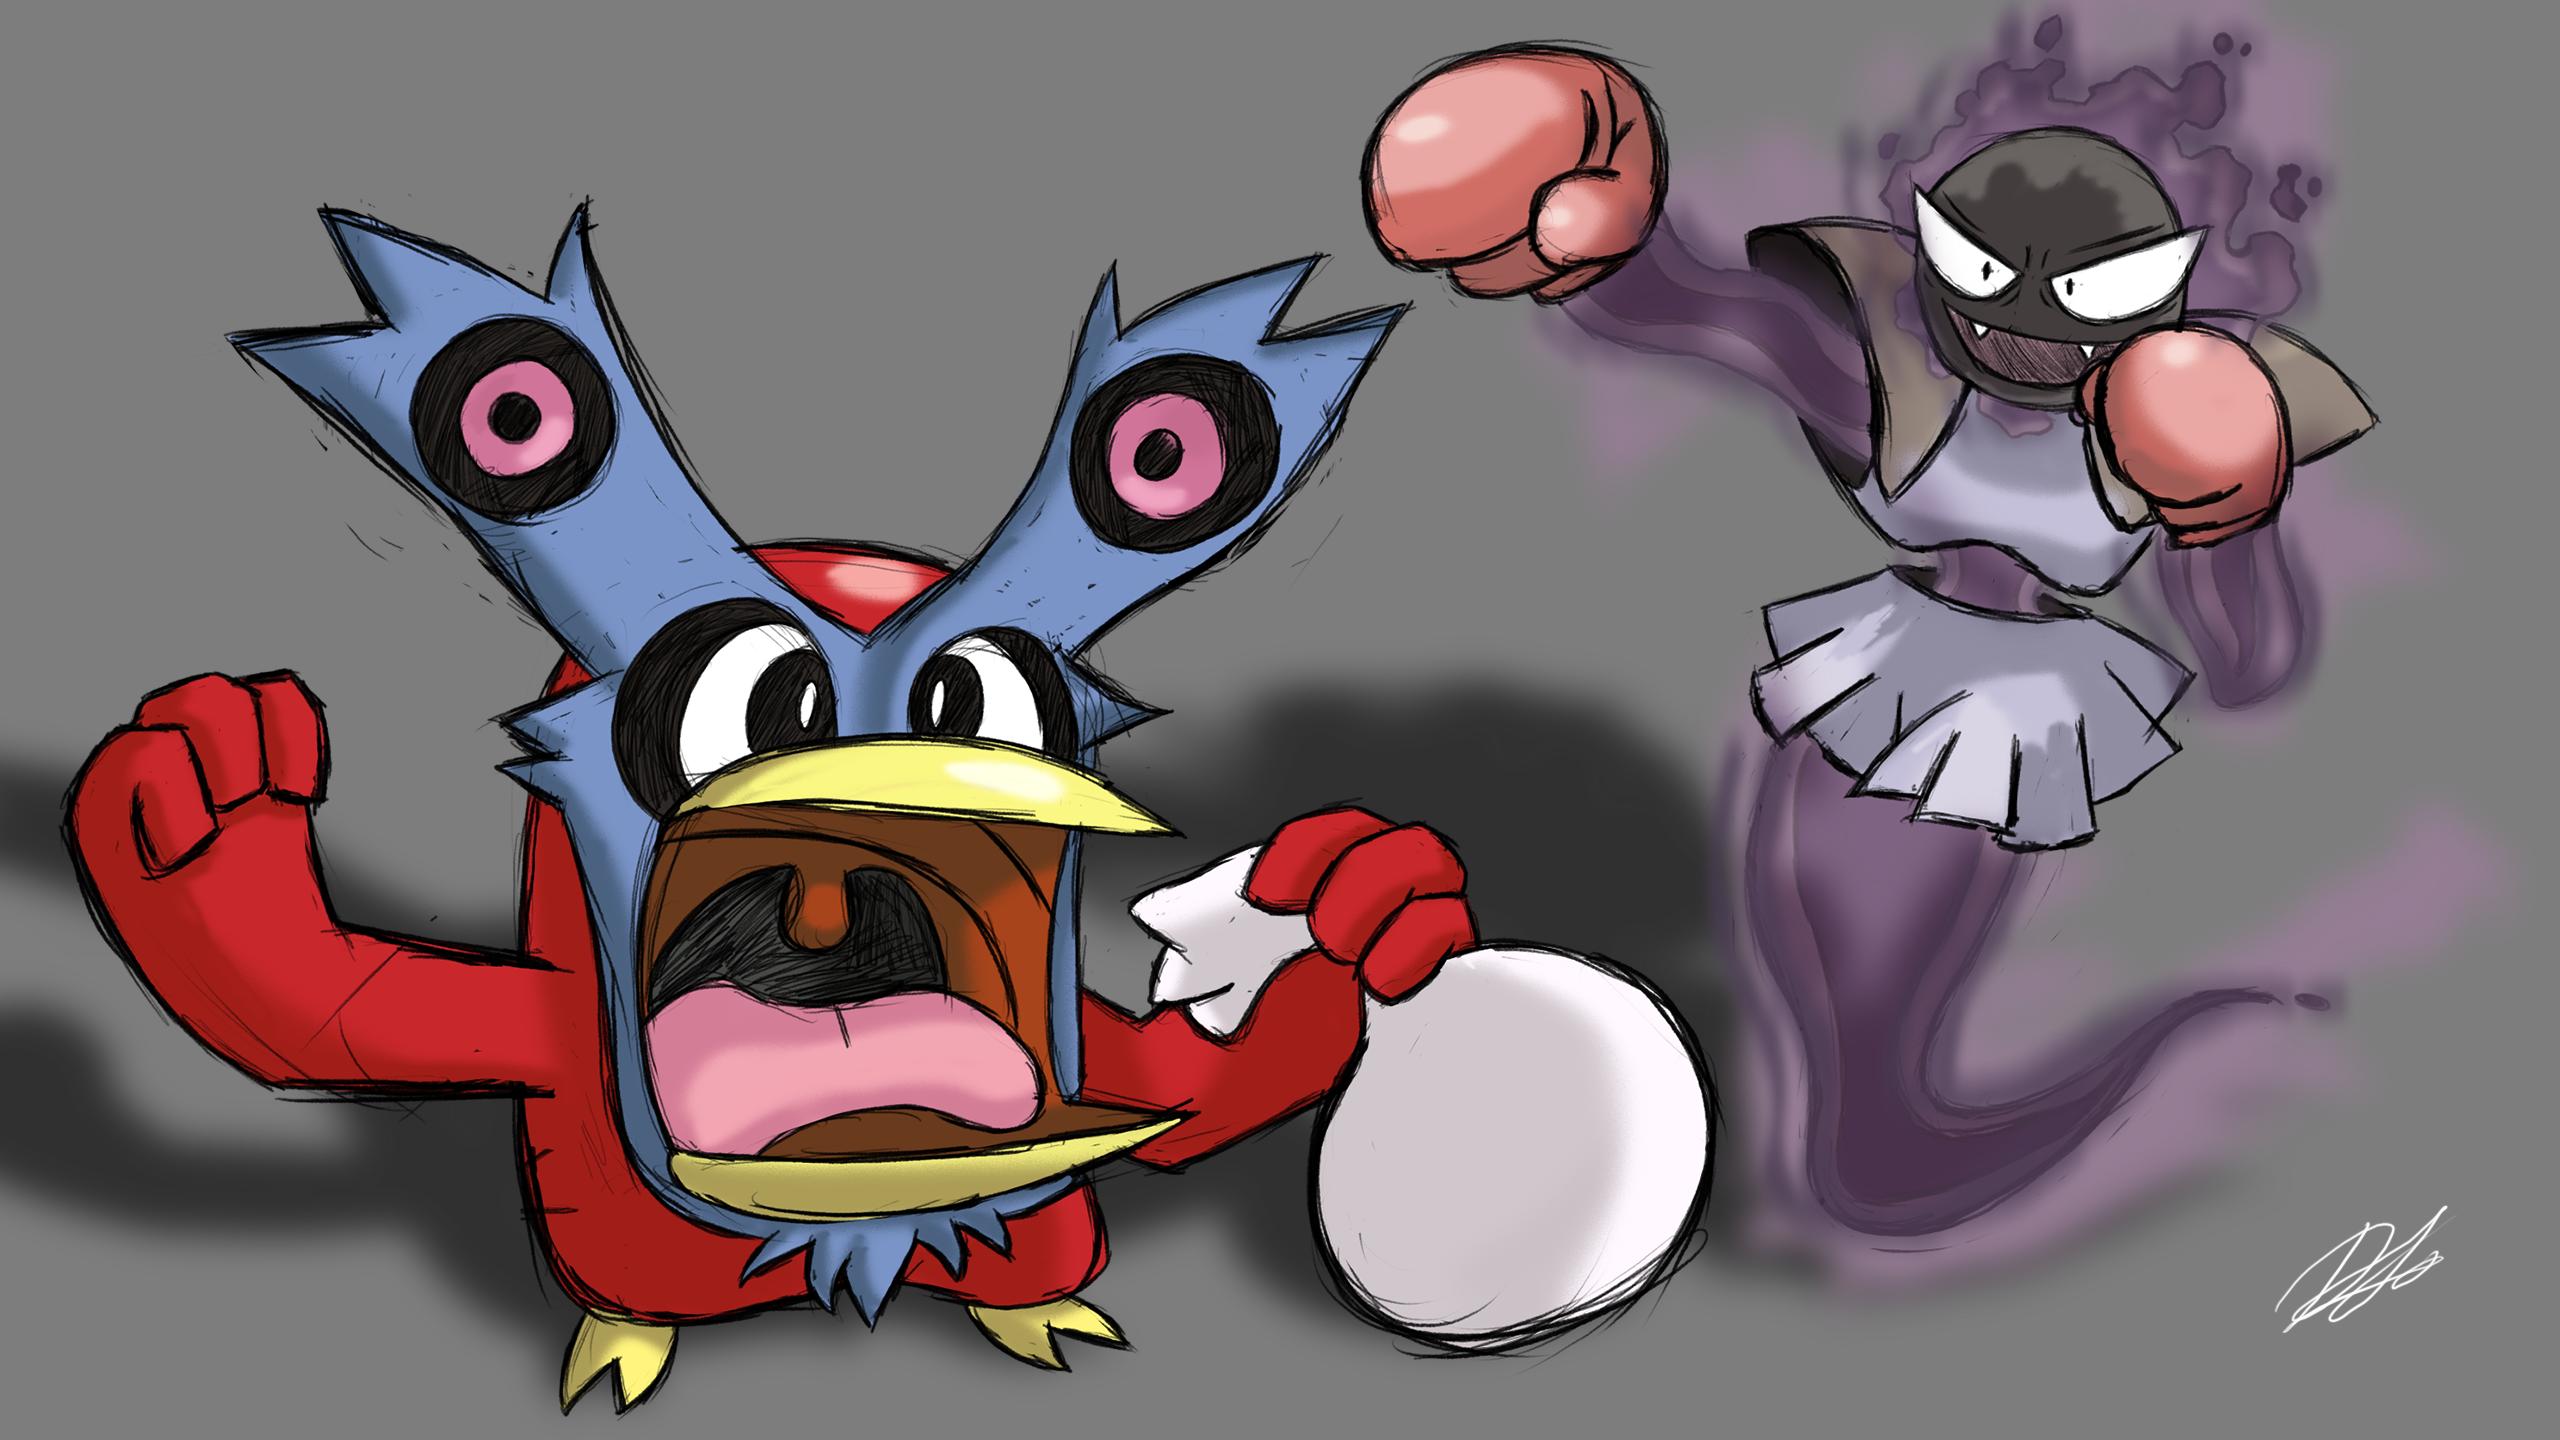 LoudBird and Gasmonchan